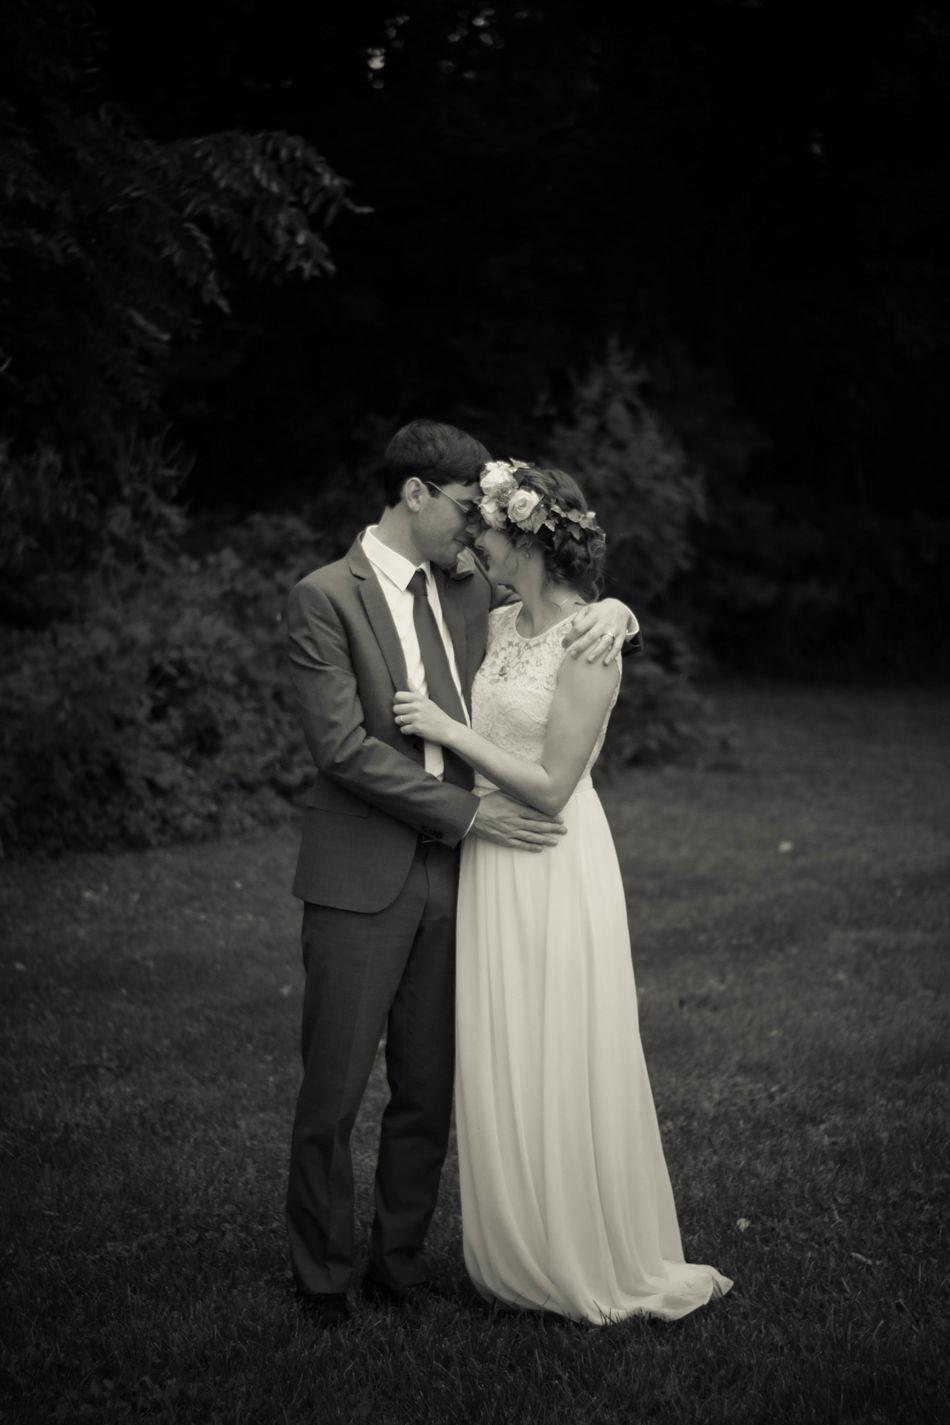 Beautiful stock photos of süße pärchen, wedding, bride, full length, two people